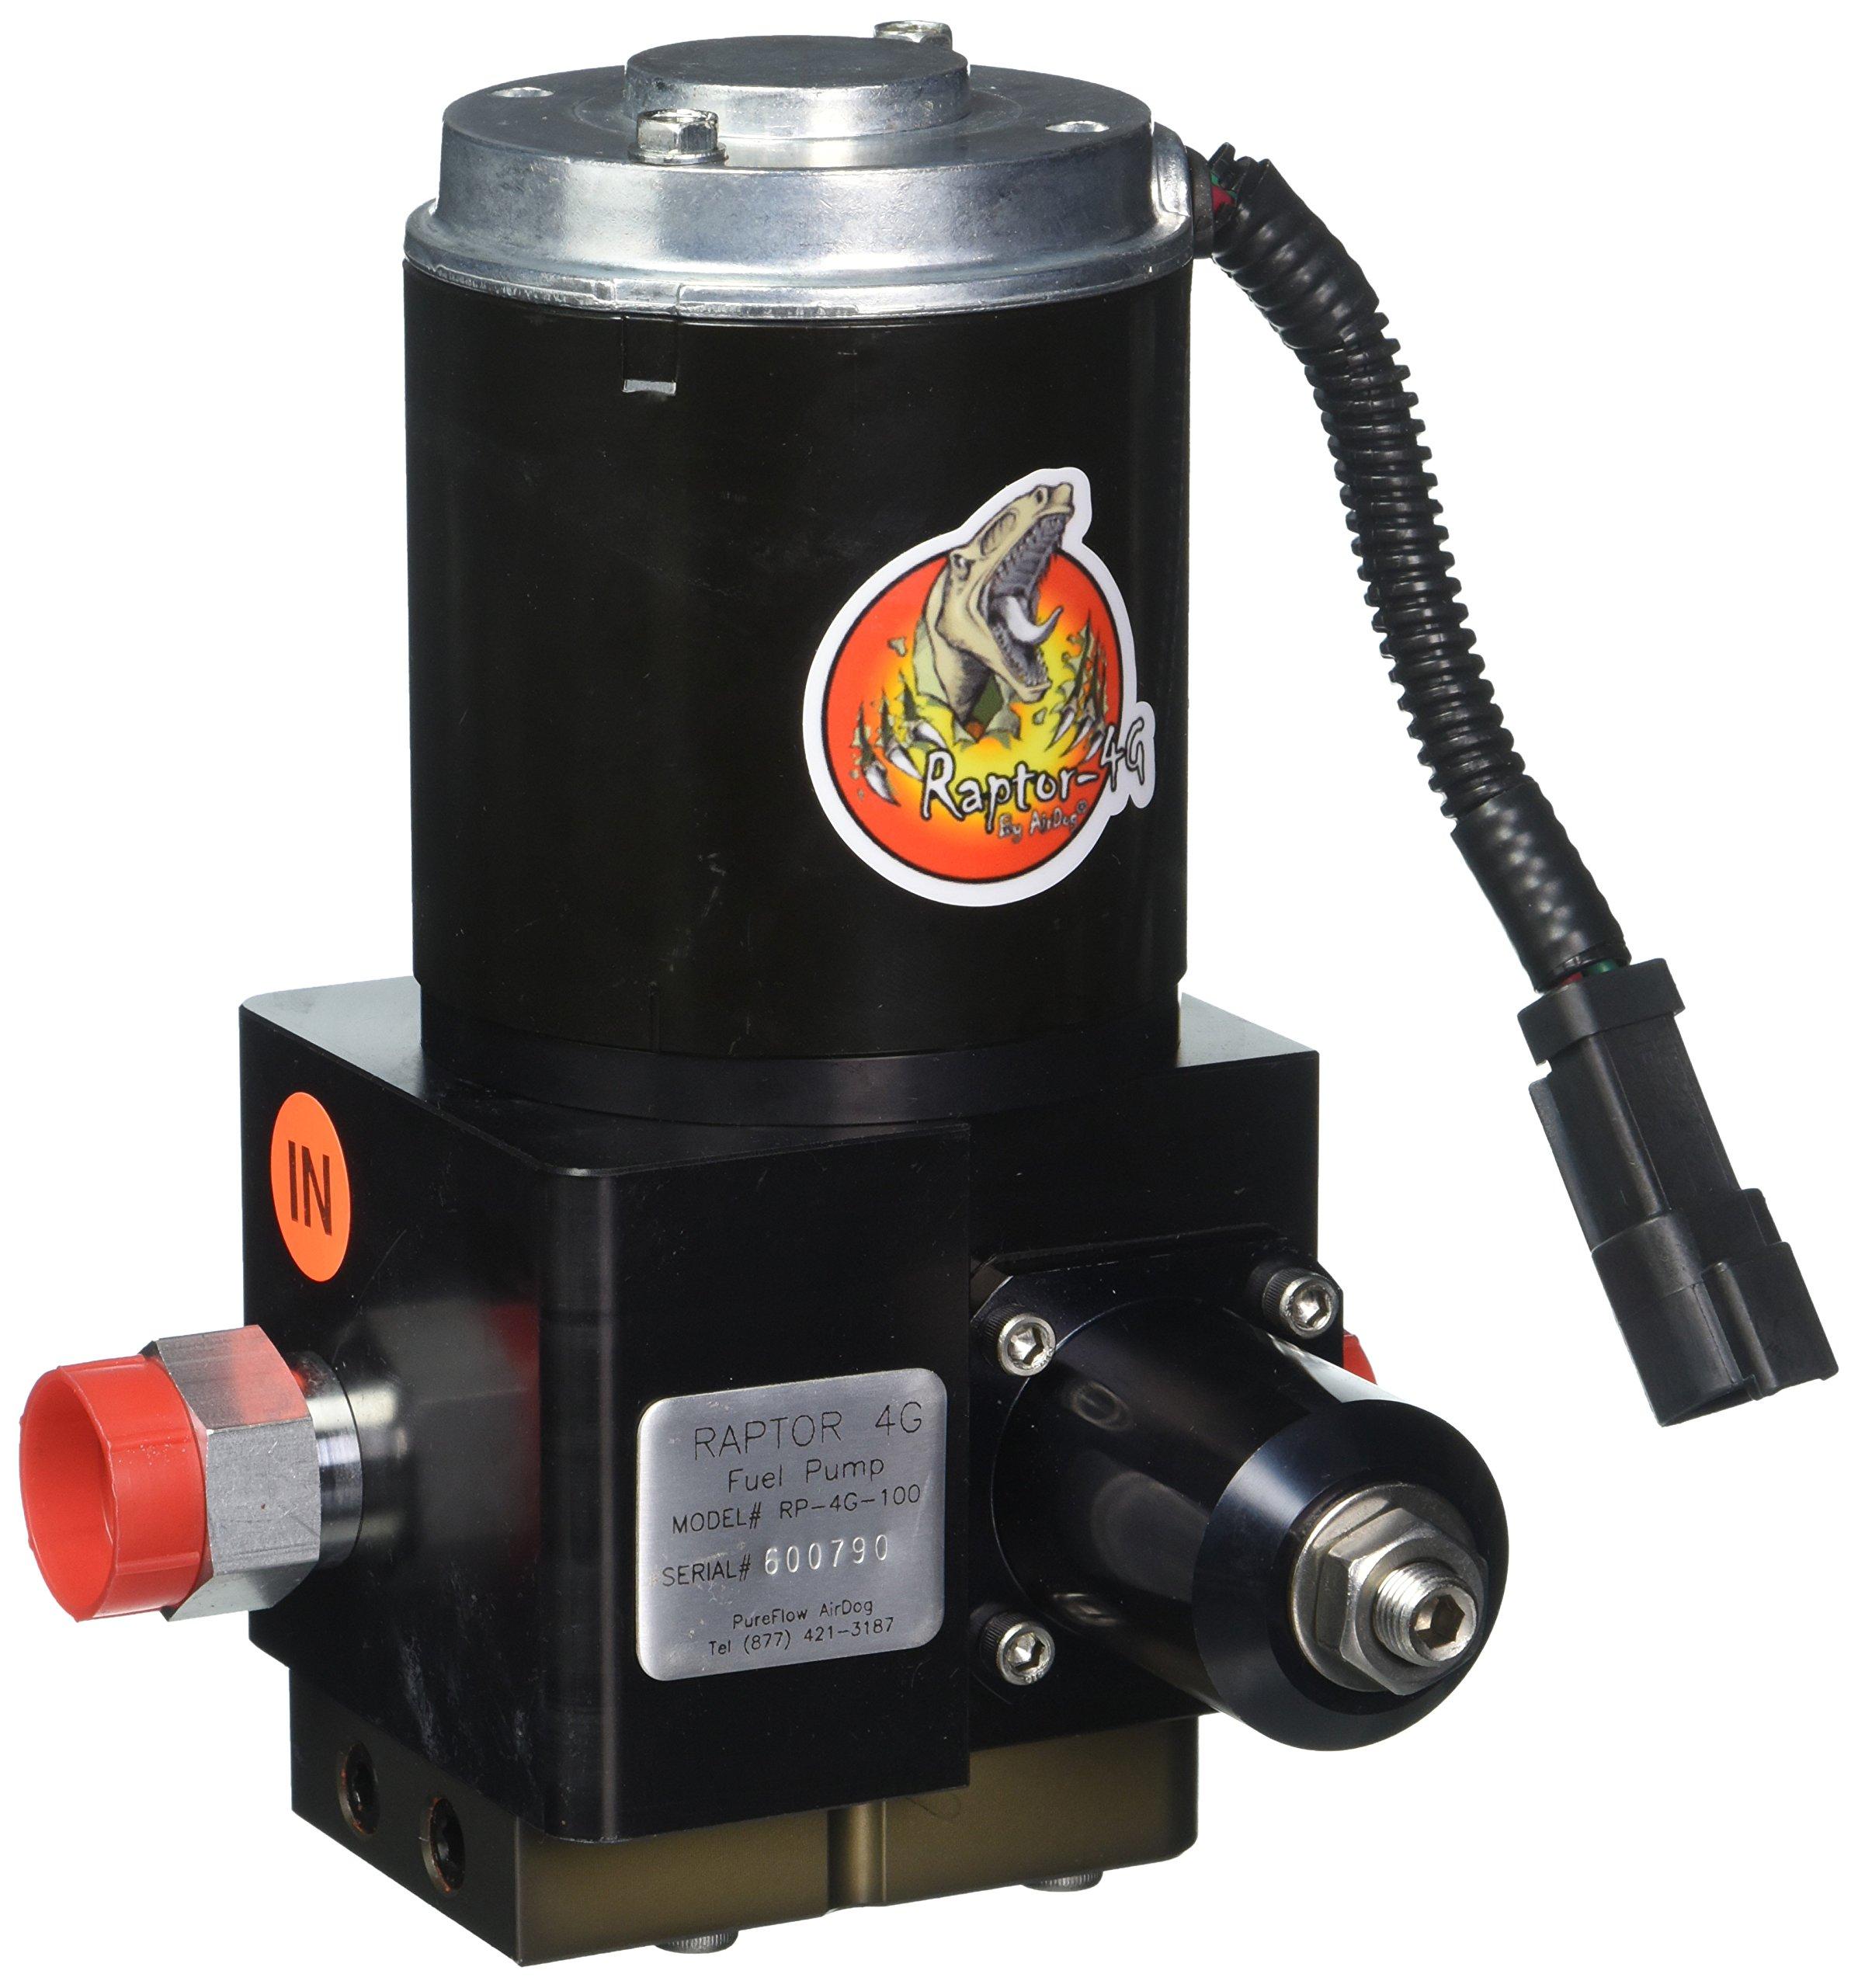 Airdog R1SBU369 Fuel Lift Pumps(Raptor Rp-150 2011-2014 Chevy Duramax)